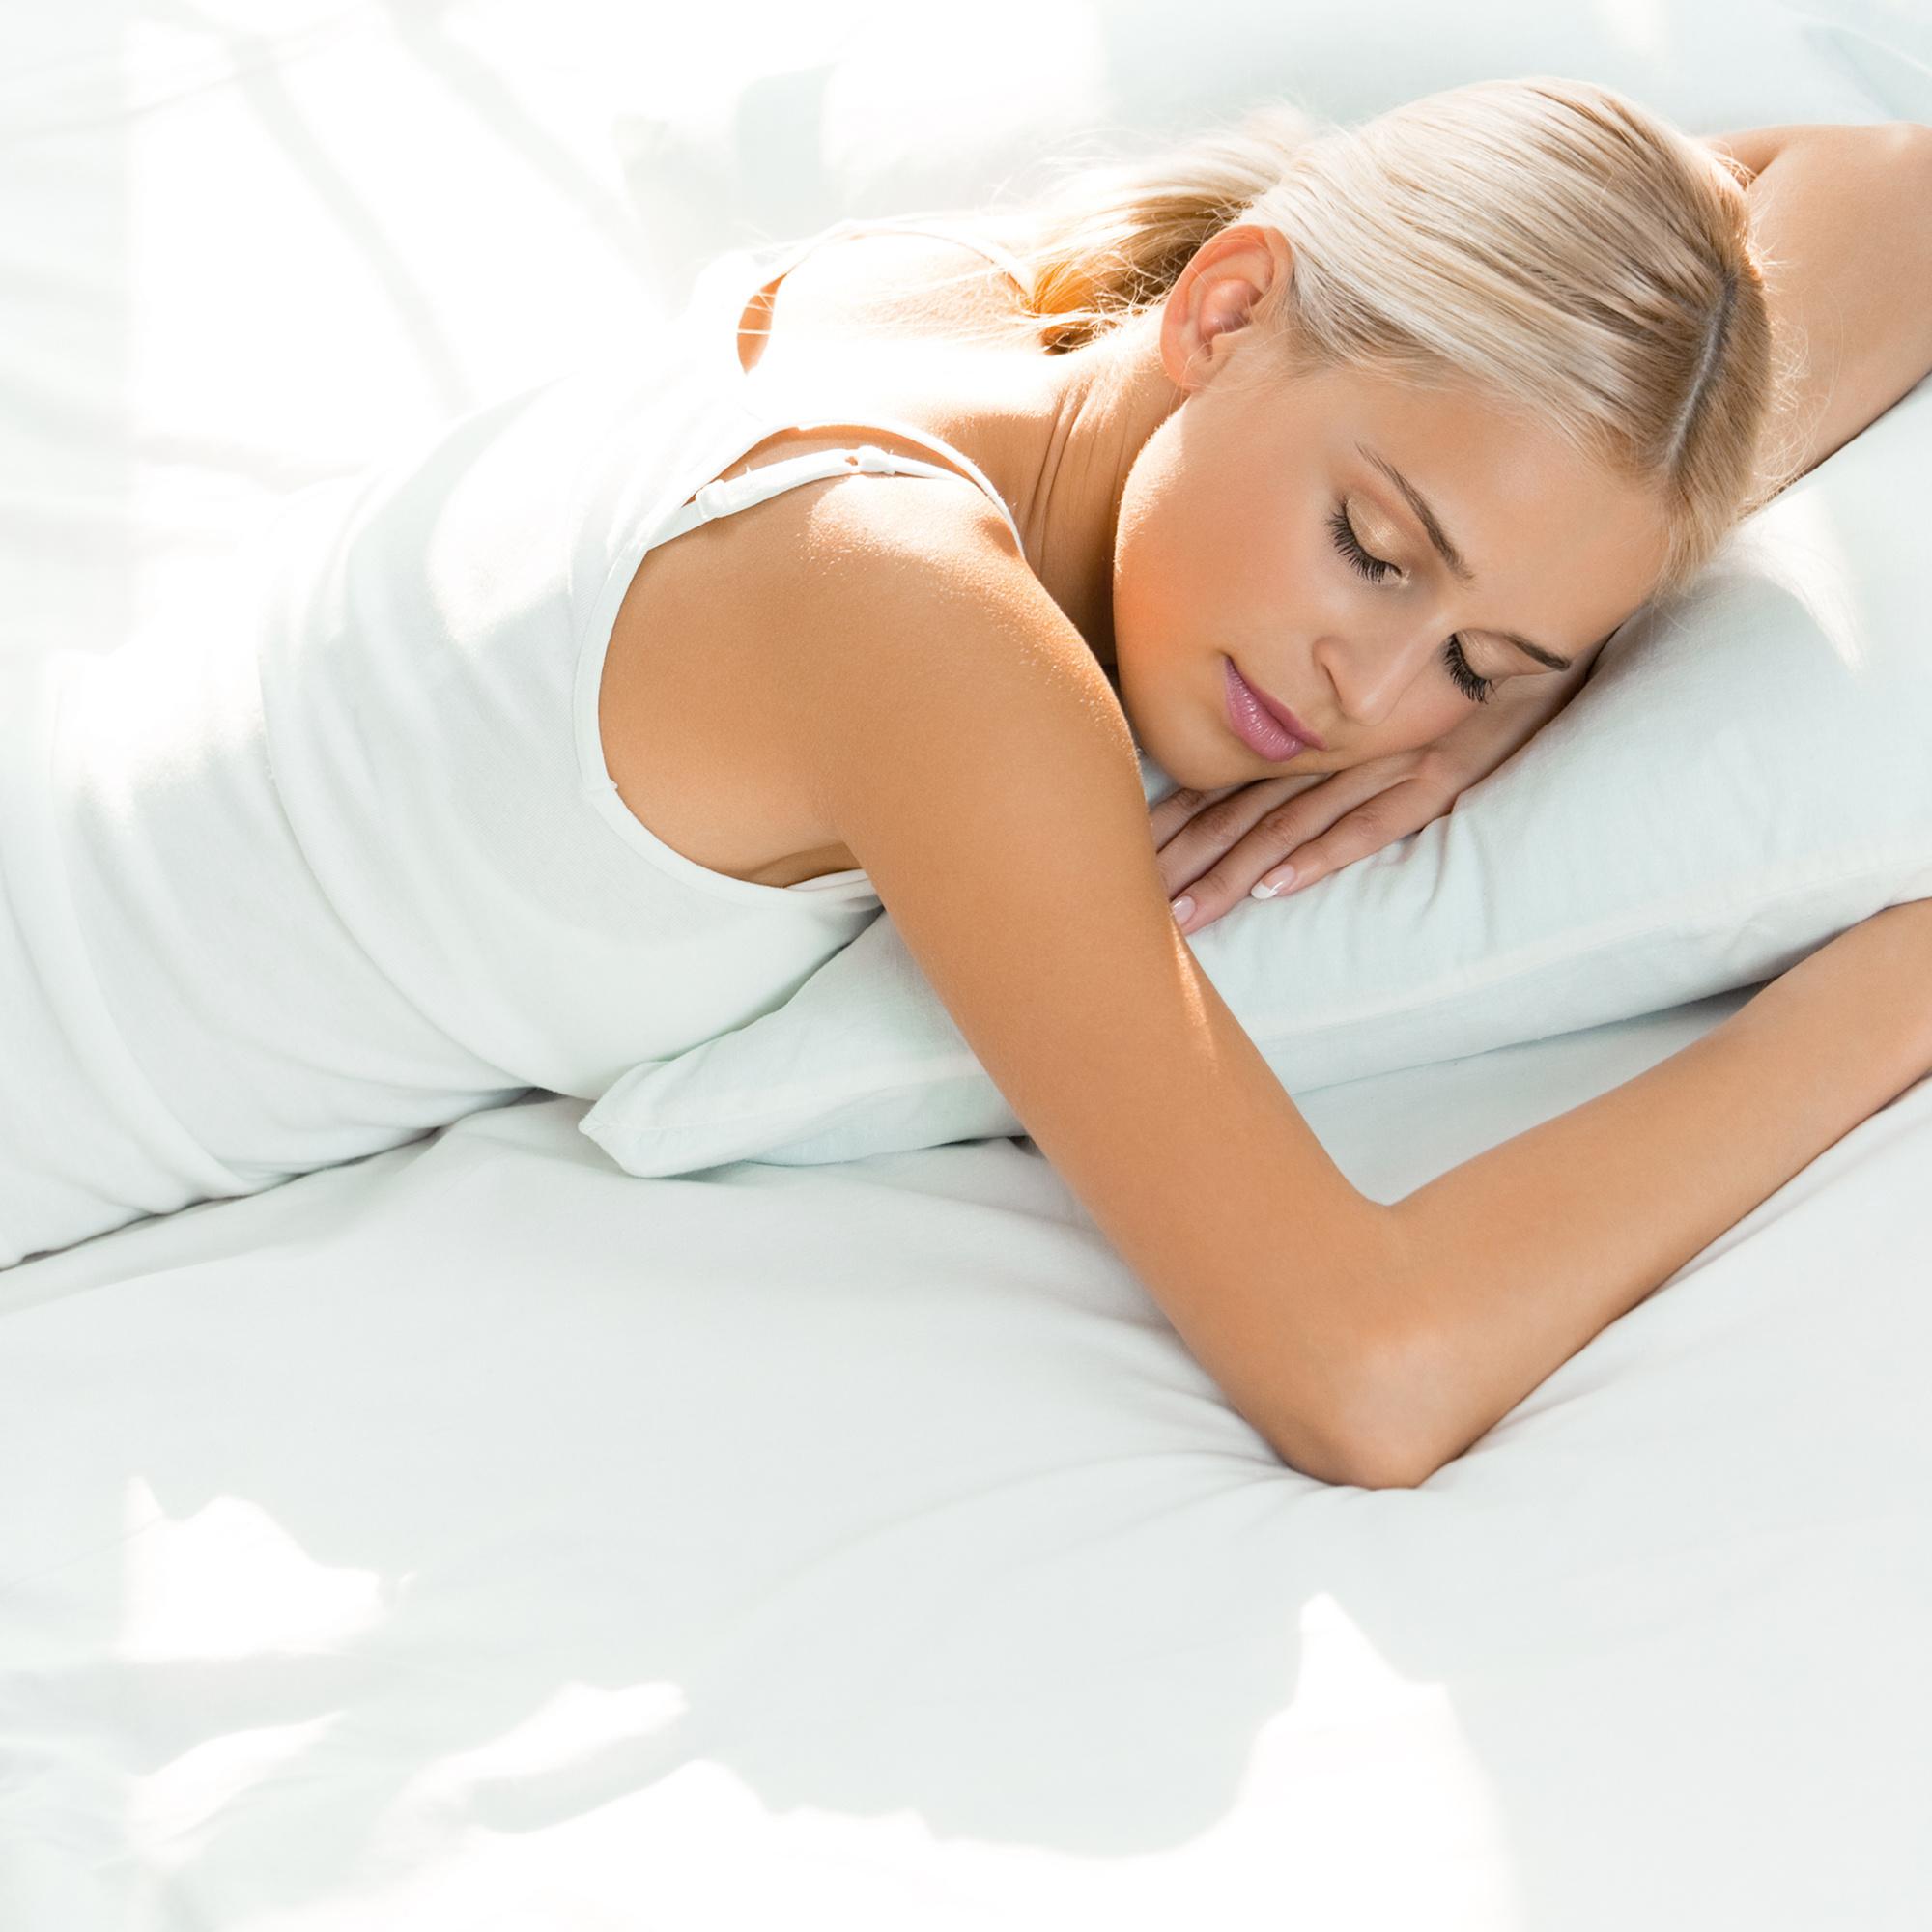 7 Weird Ways to Cure Sleep Apnea - Cloud Media News